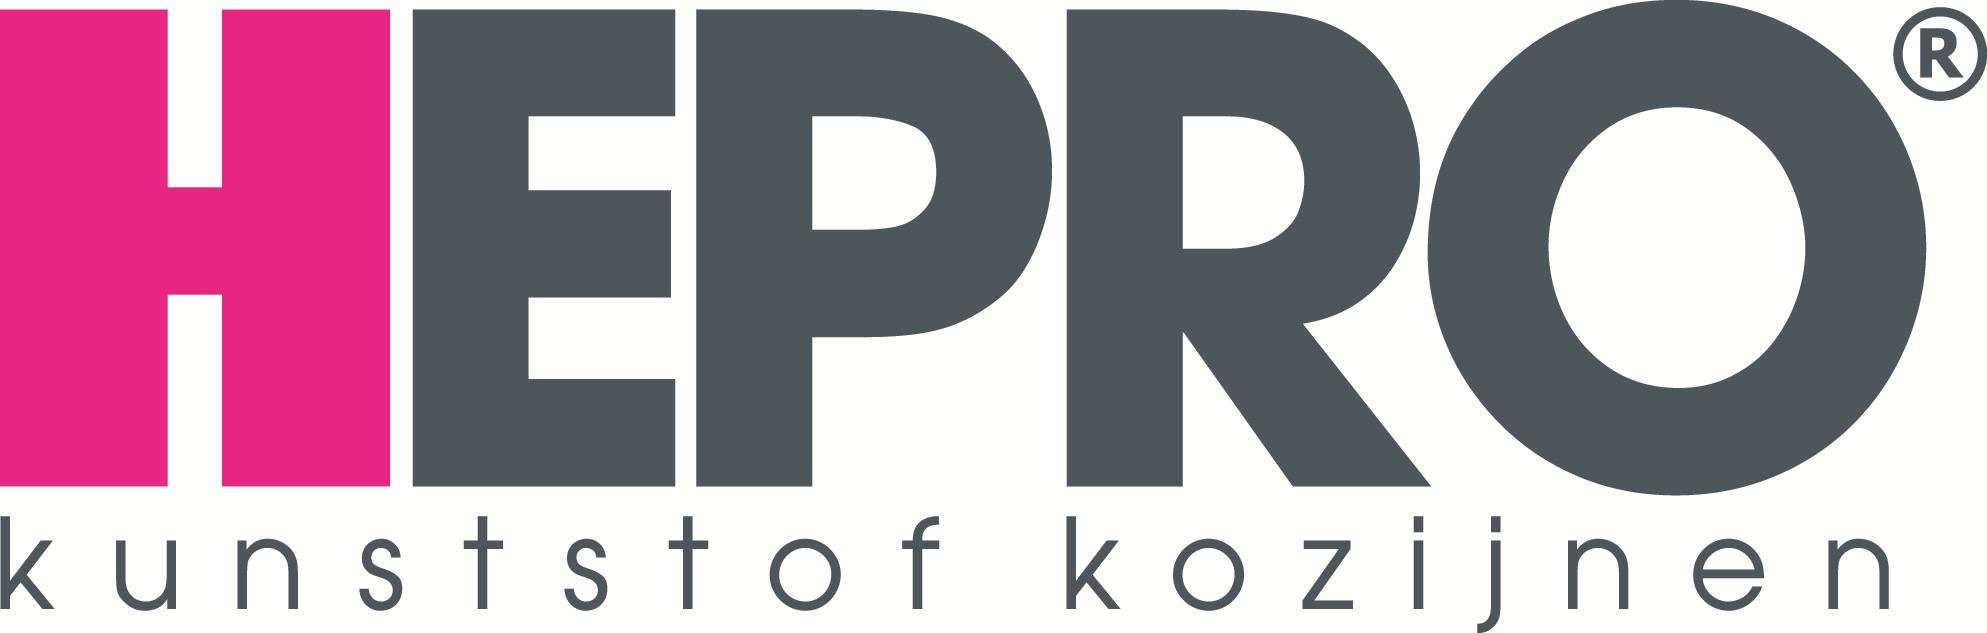 HEPRO-logo (003).png